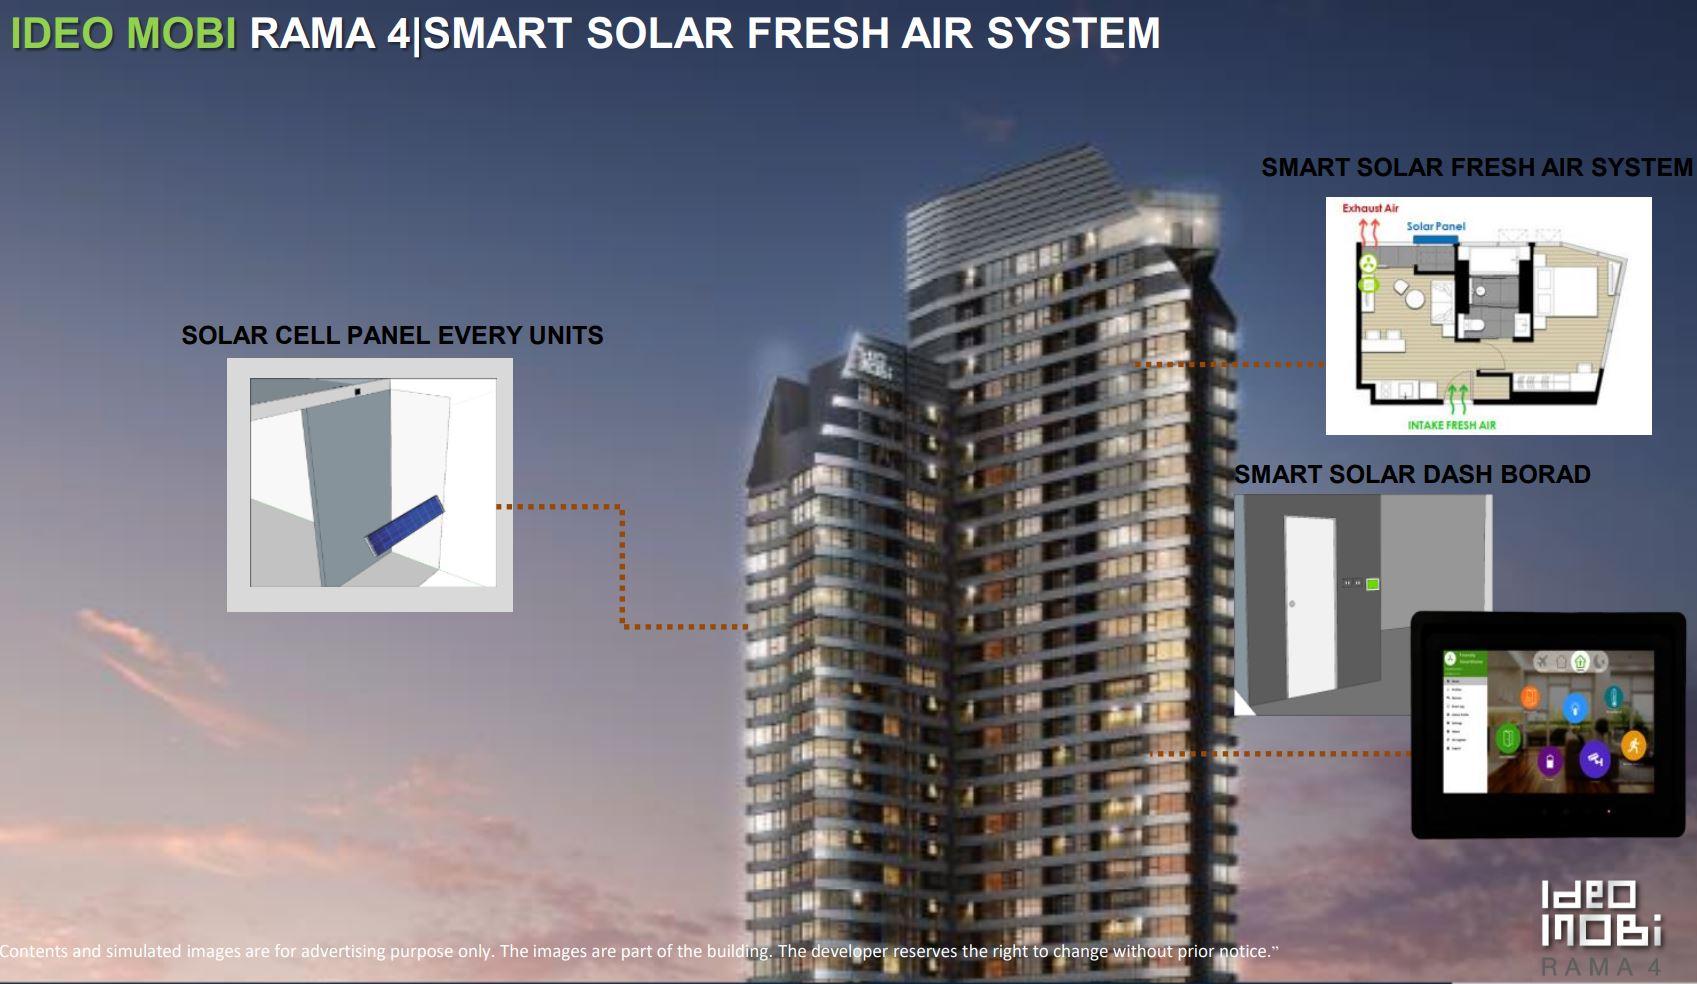 Ideo-Mobi-Rama-4-Smart-System